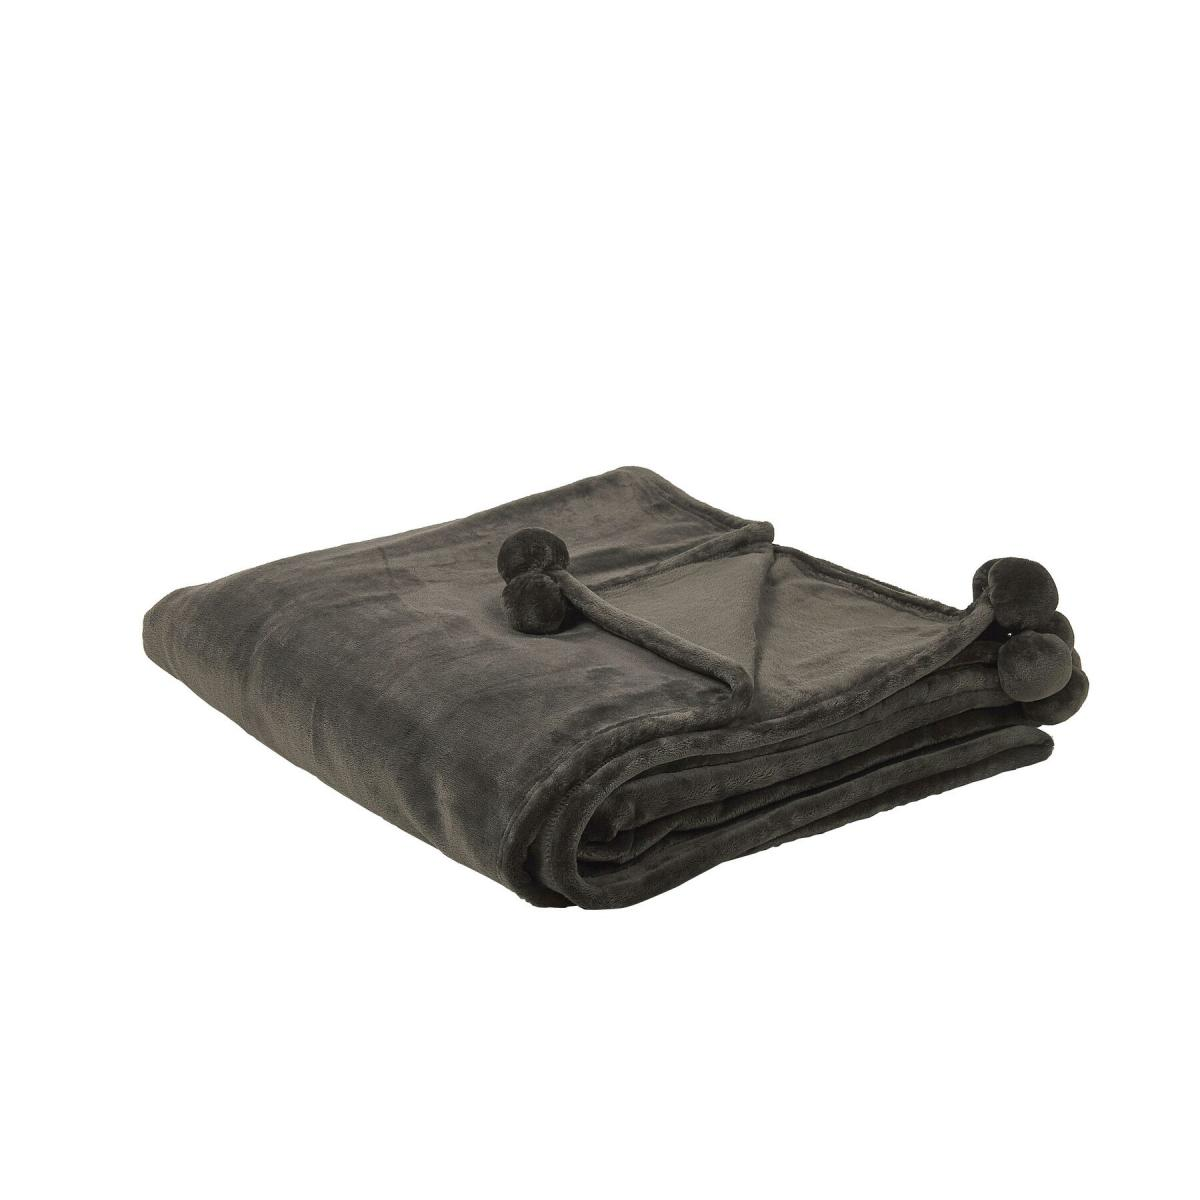 Beliani Beliani Plaid gris foncé 200 x 220 cm TERKE - gris foncé